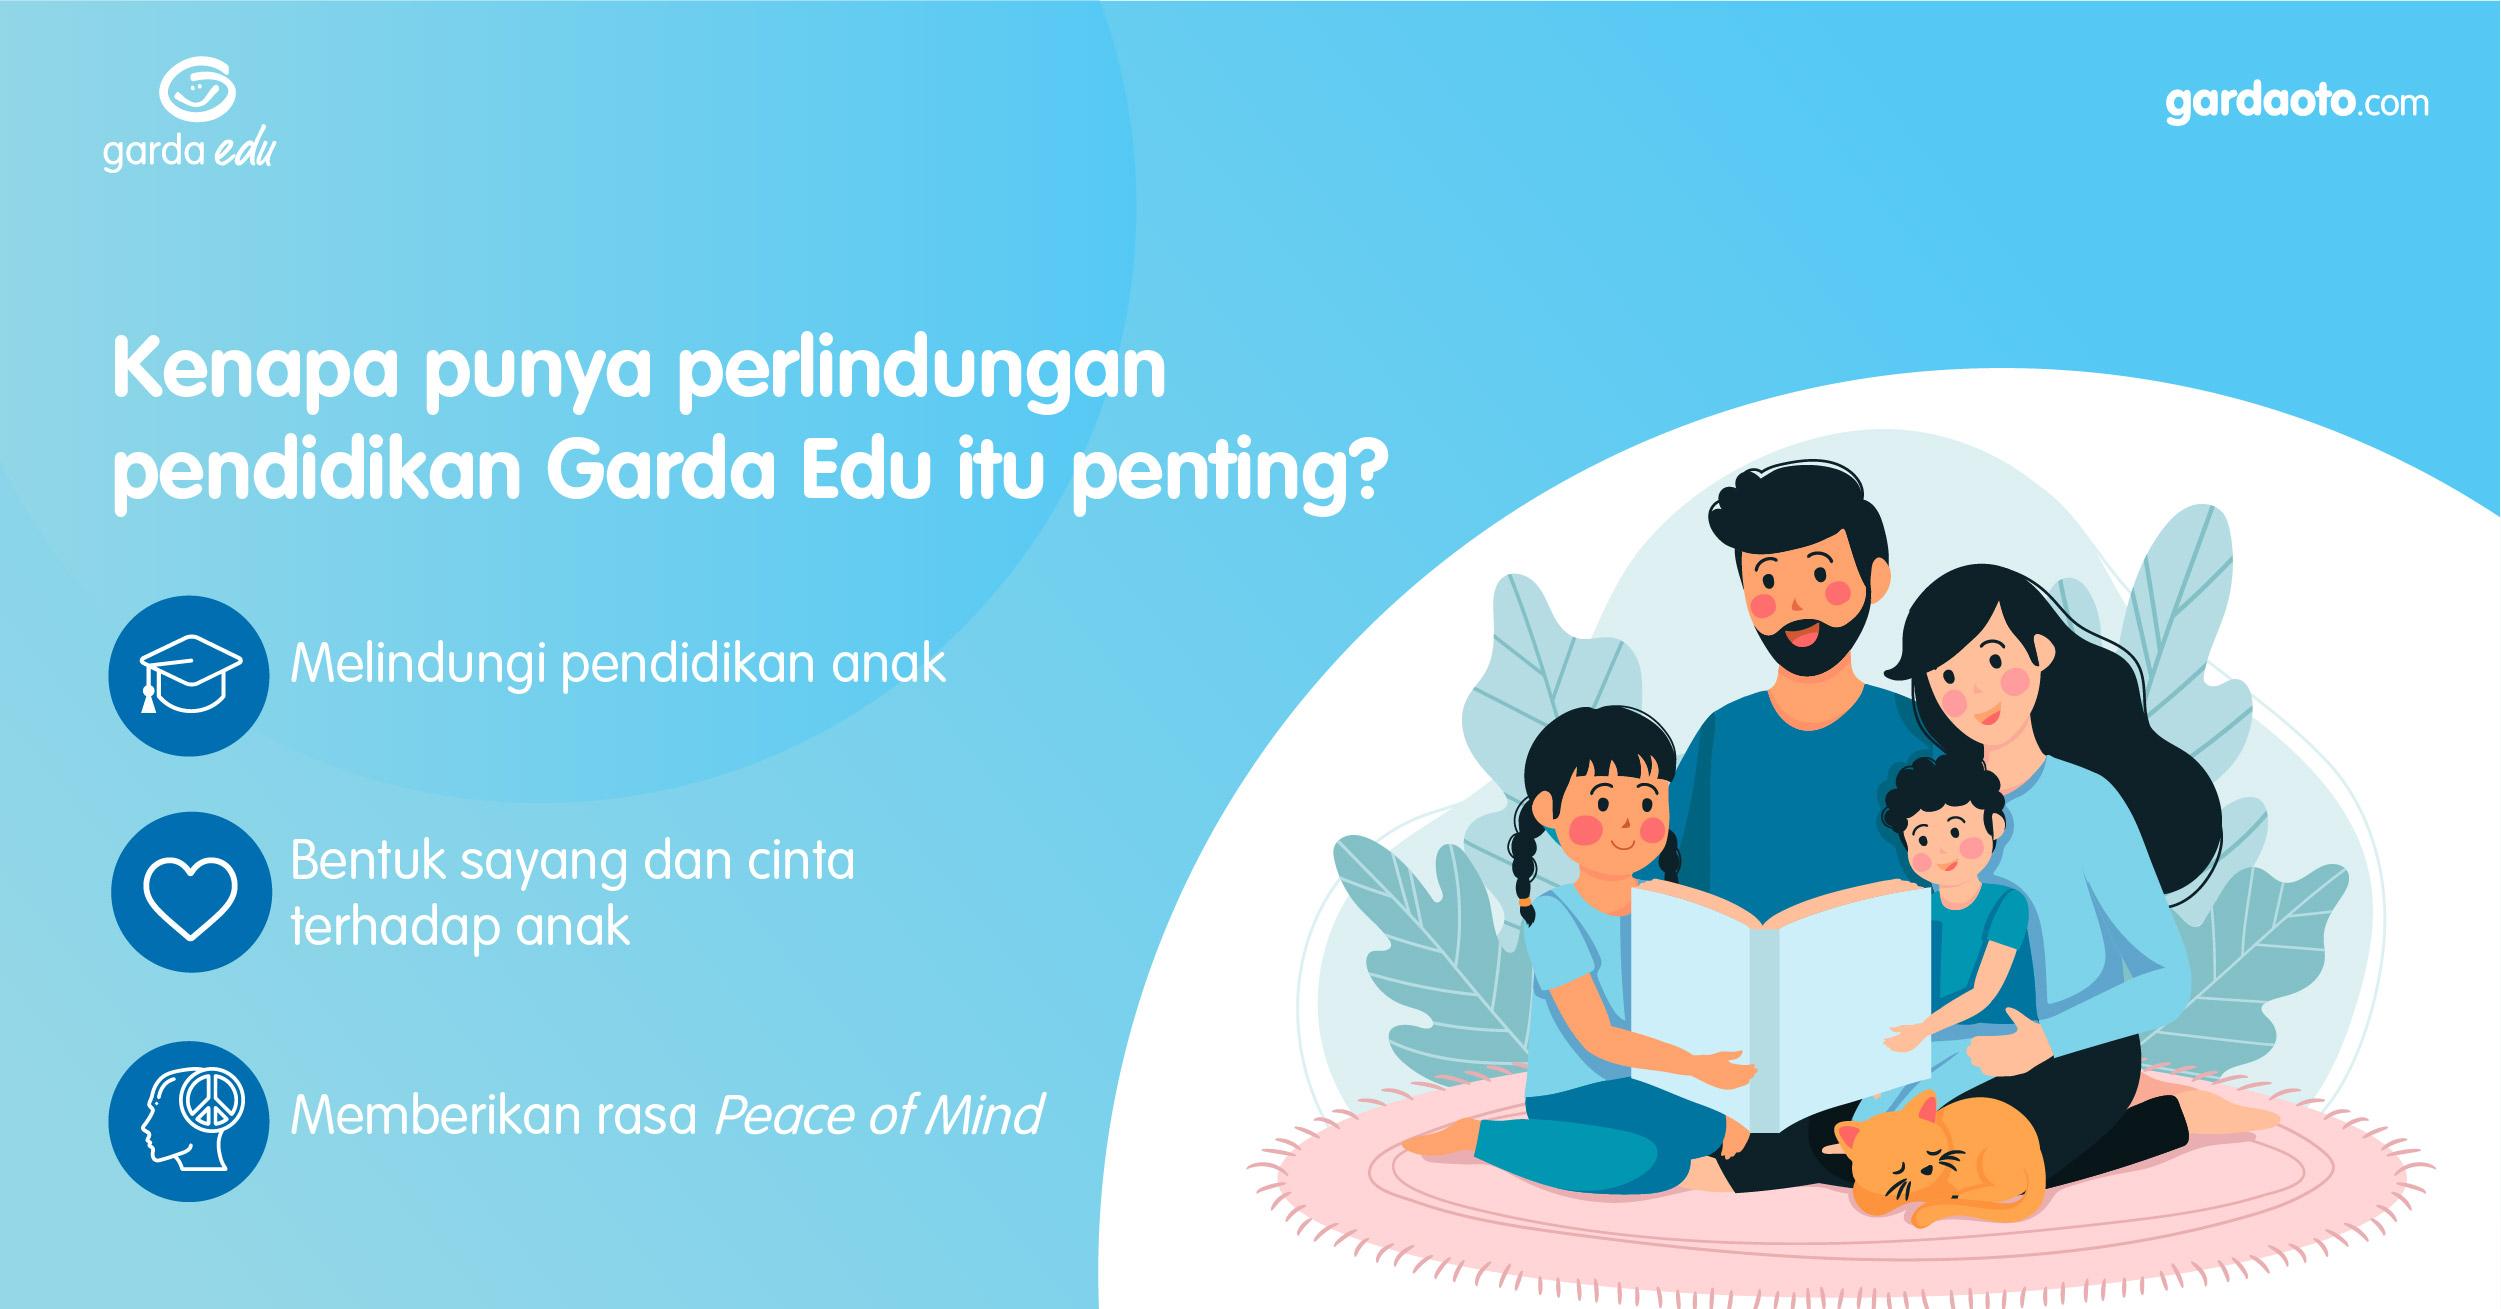 Pentingnya asuransi pendidikan anak Garda Edu untuk masa depan